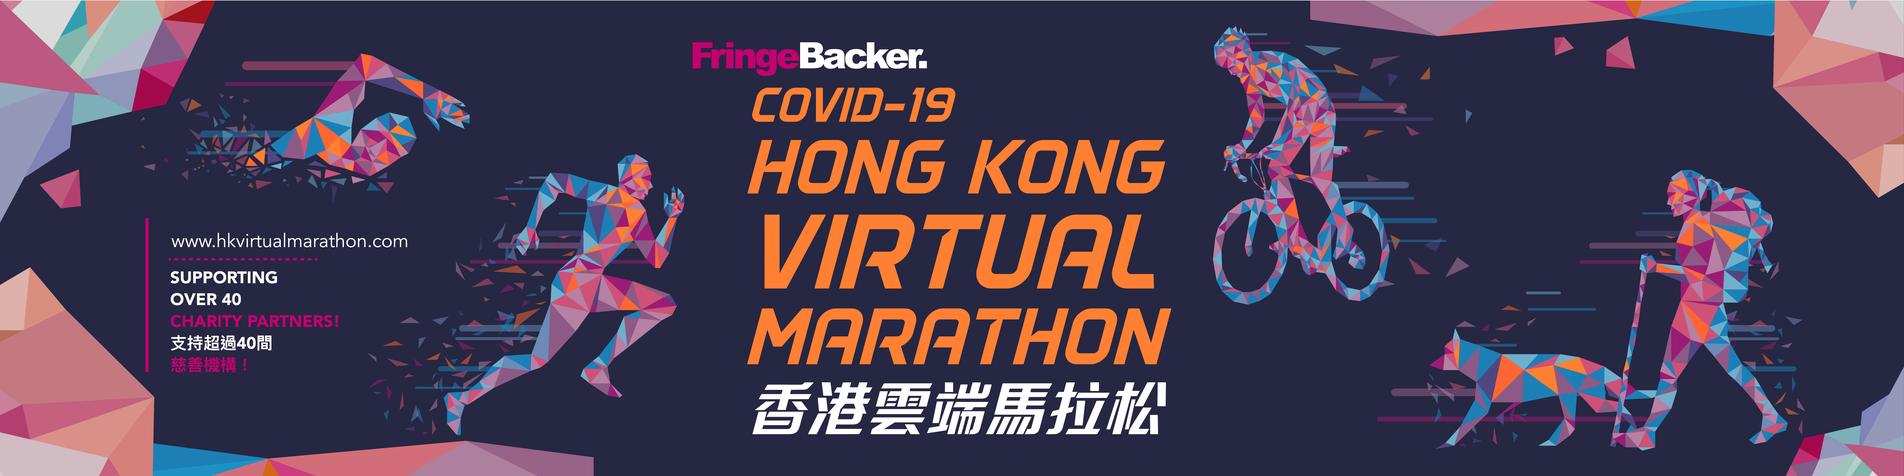 FringeBacker COVID-19 Hong Kong Virtual Marathon